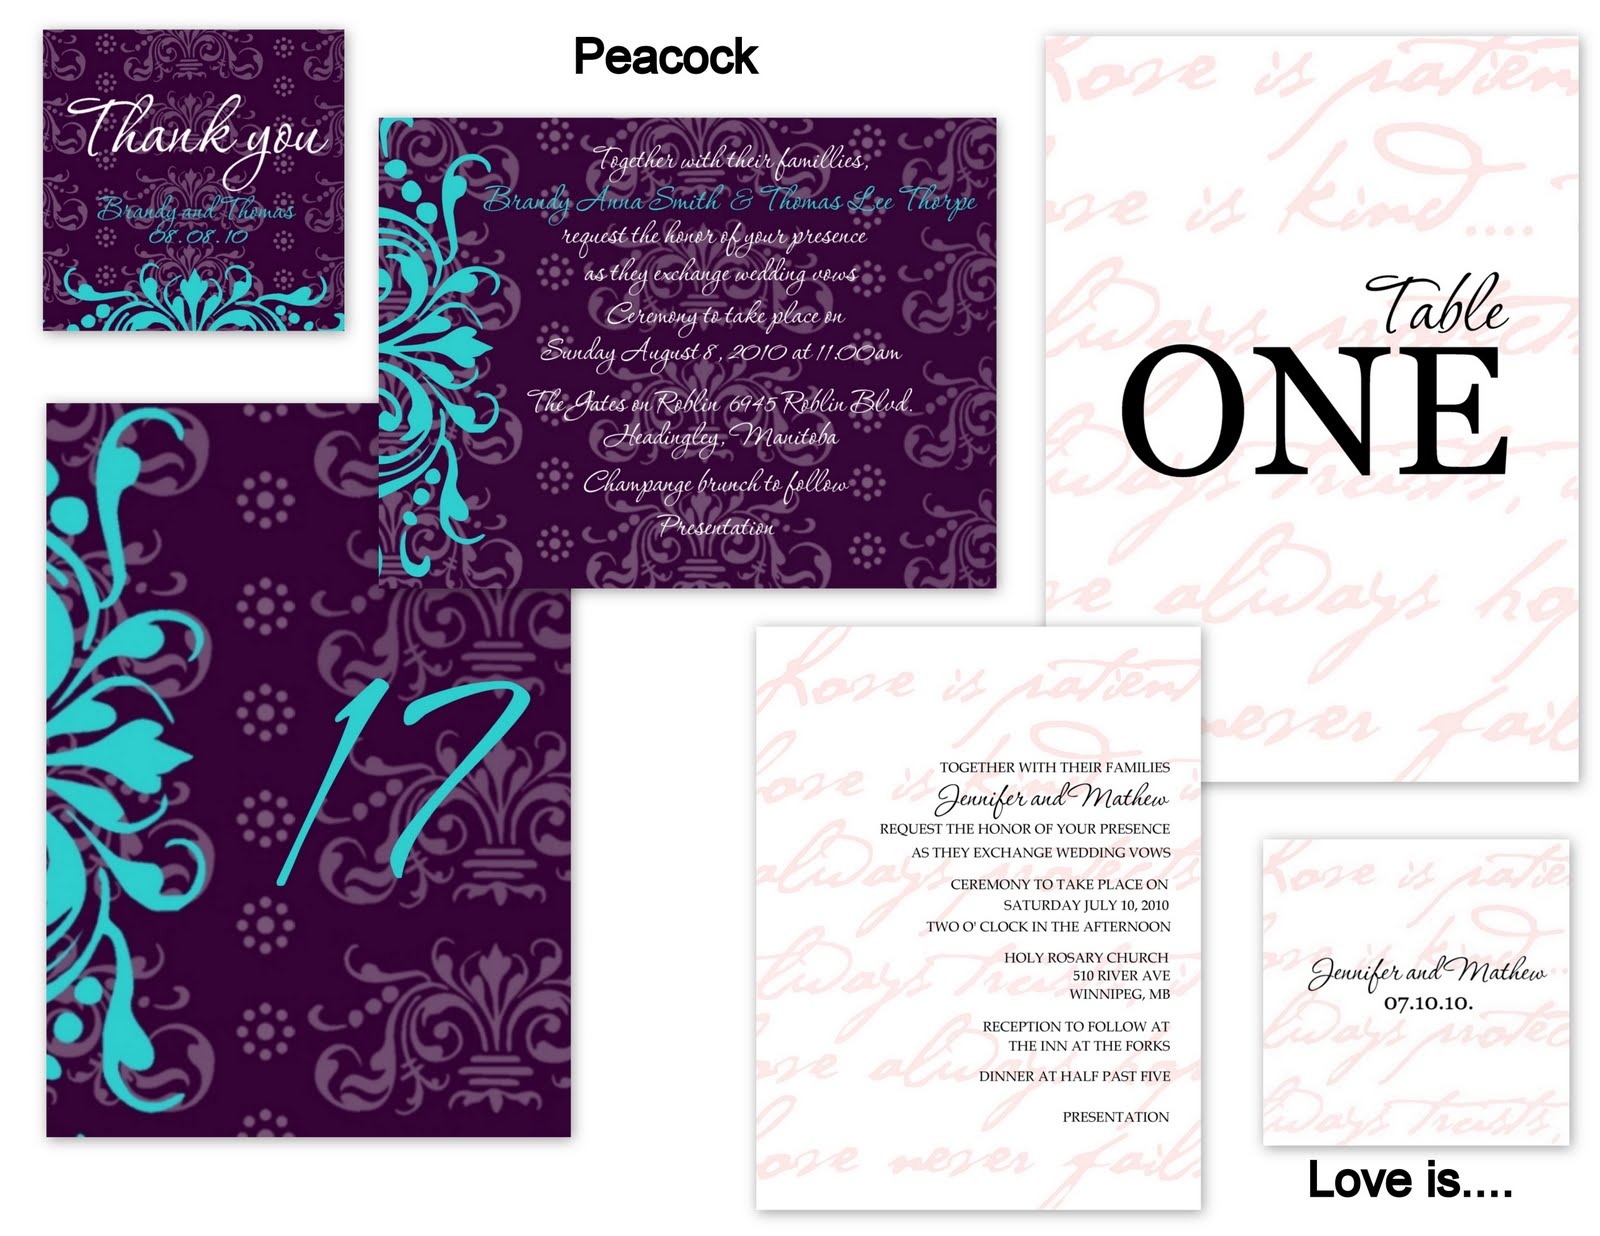 Winnipeg Wedding Invitations Products And Designs